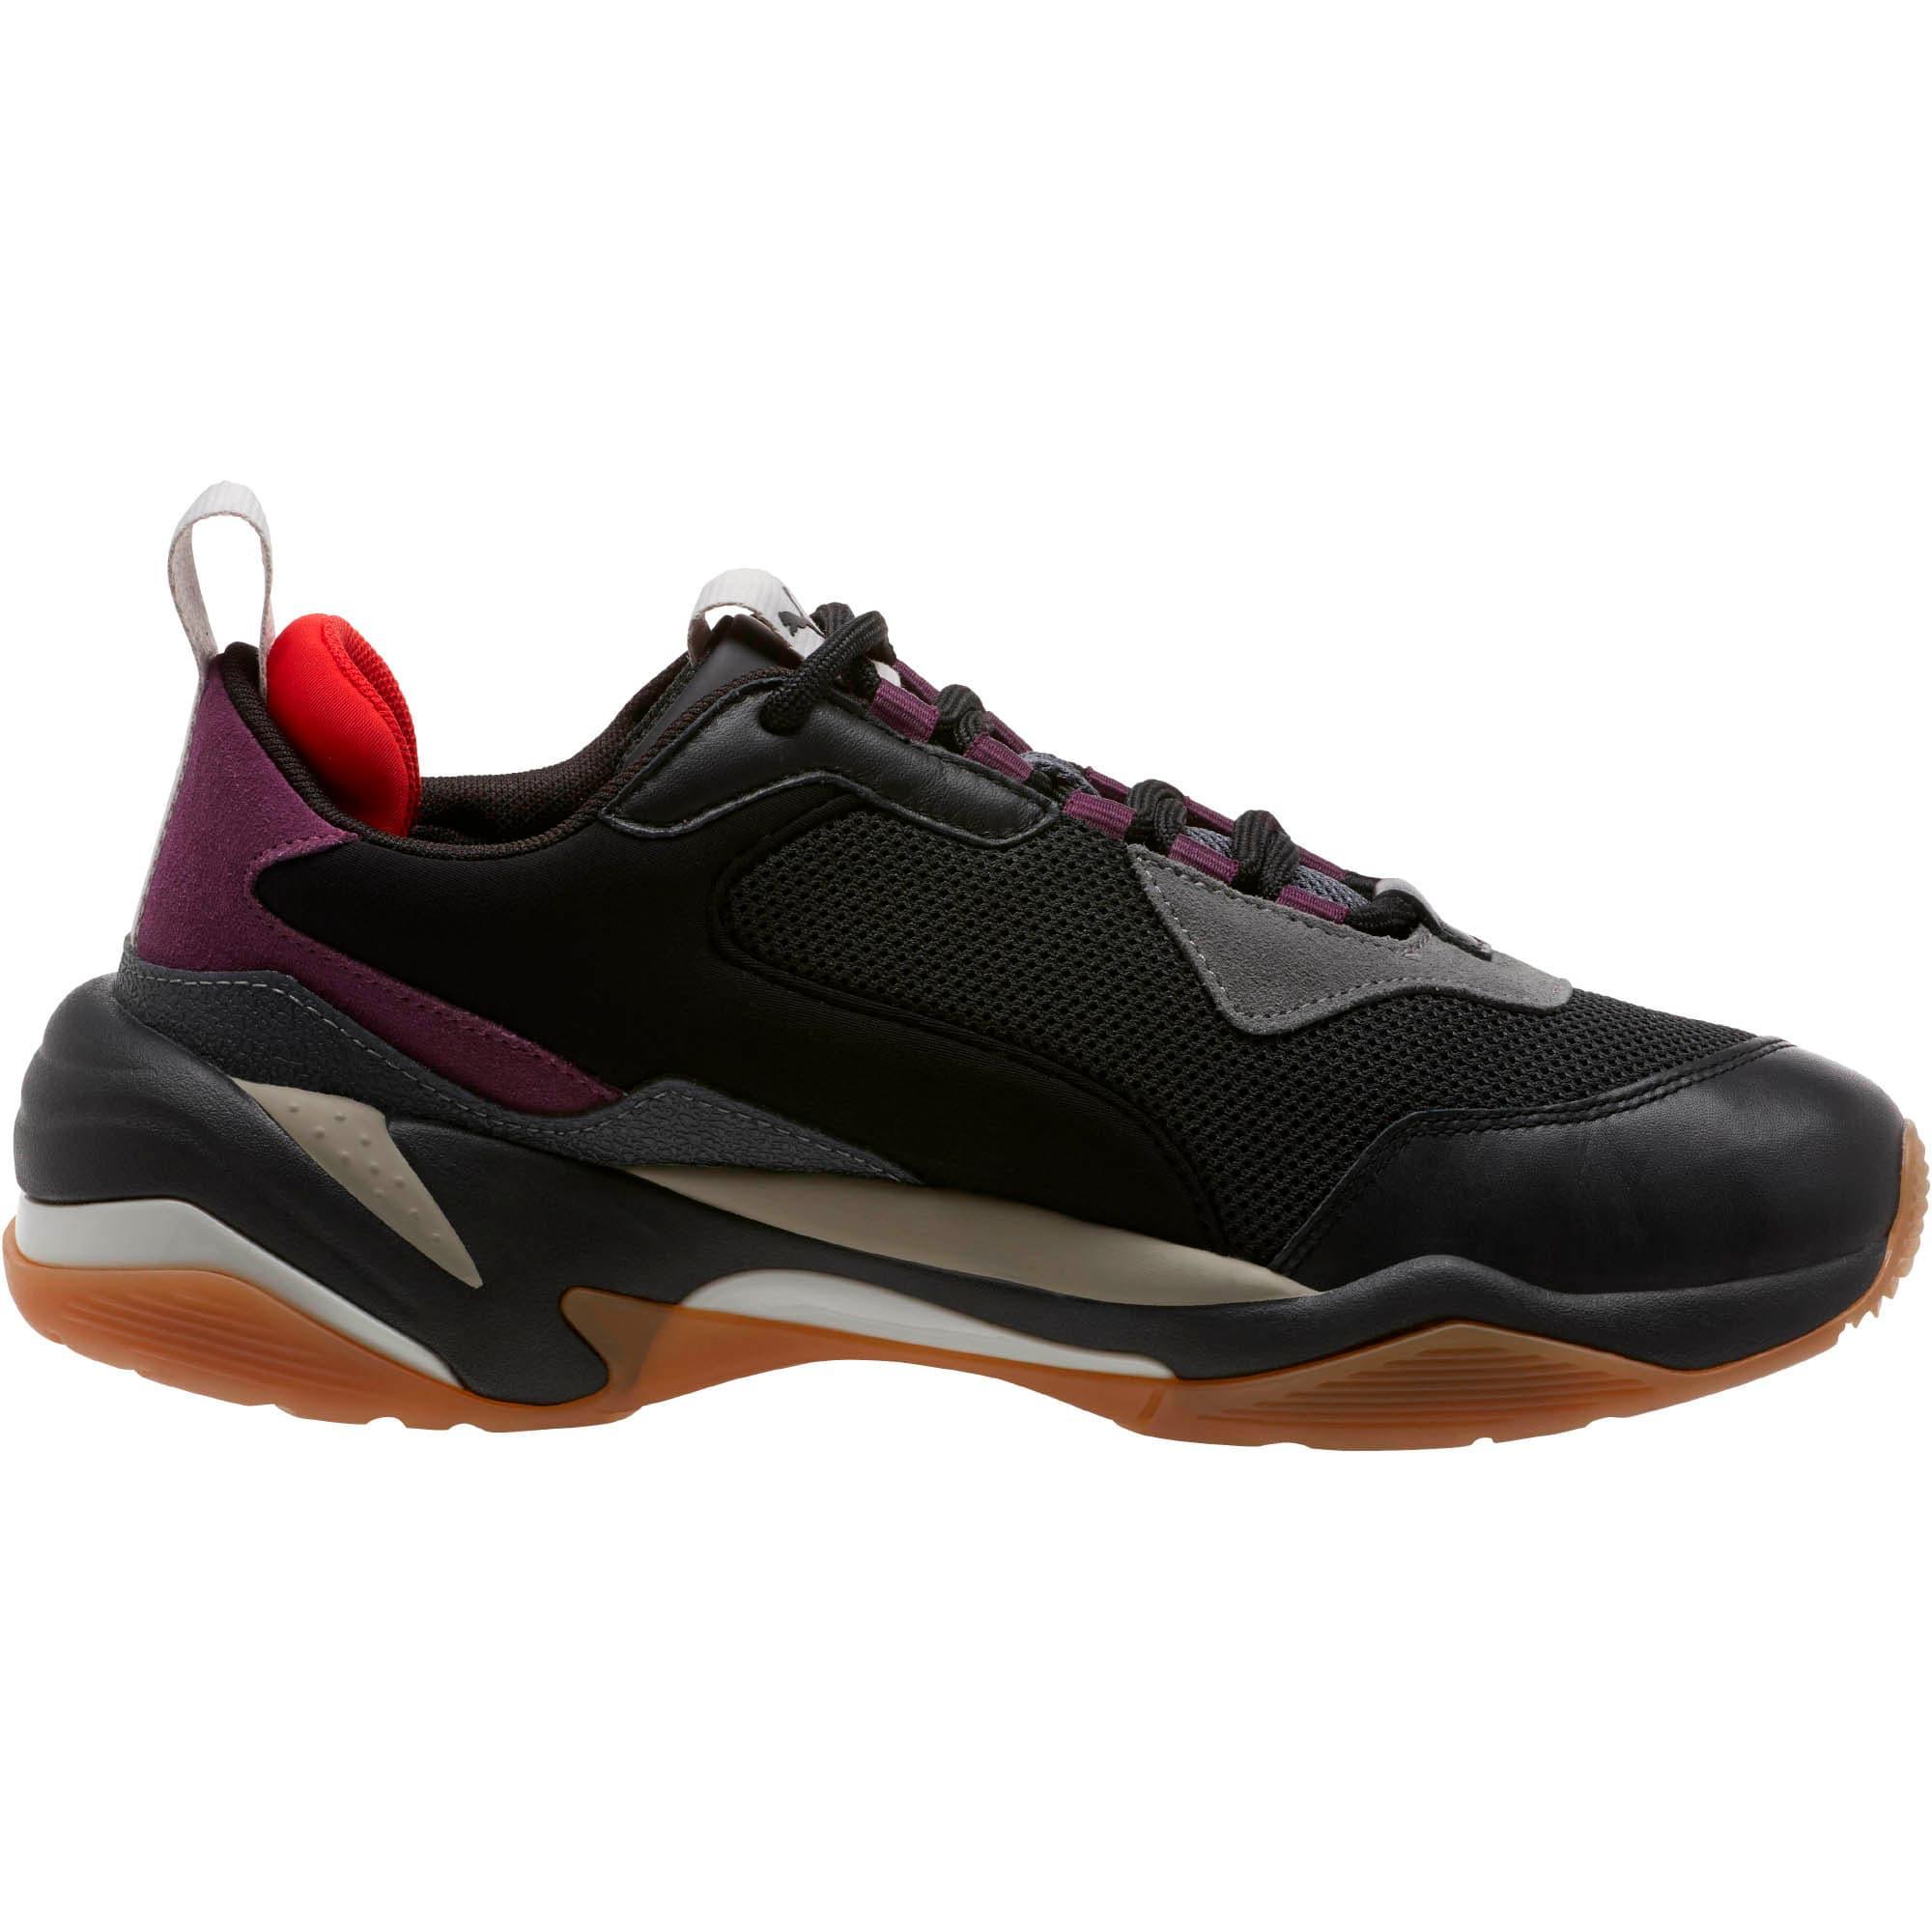 Thumbnail 3 of Thunder Spectra Sneakers, Puma Black, medium